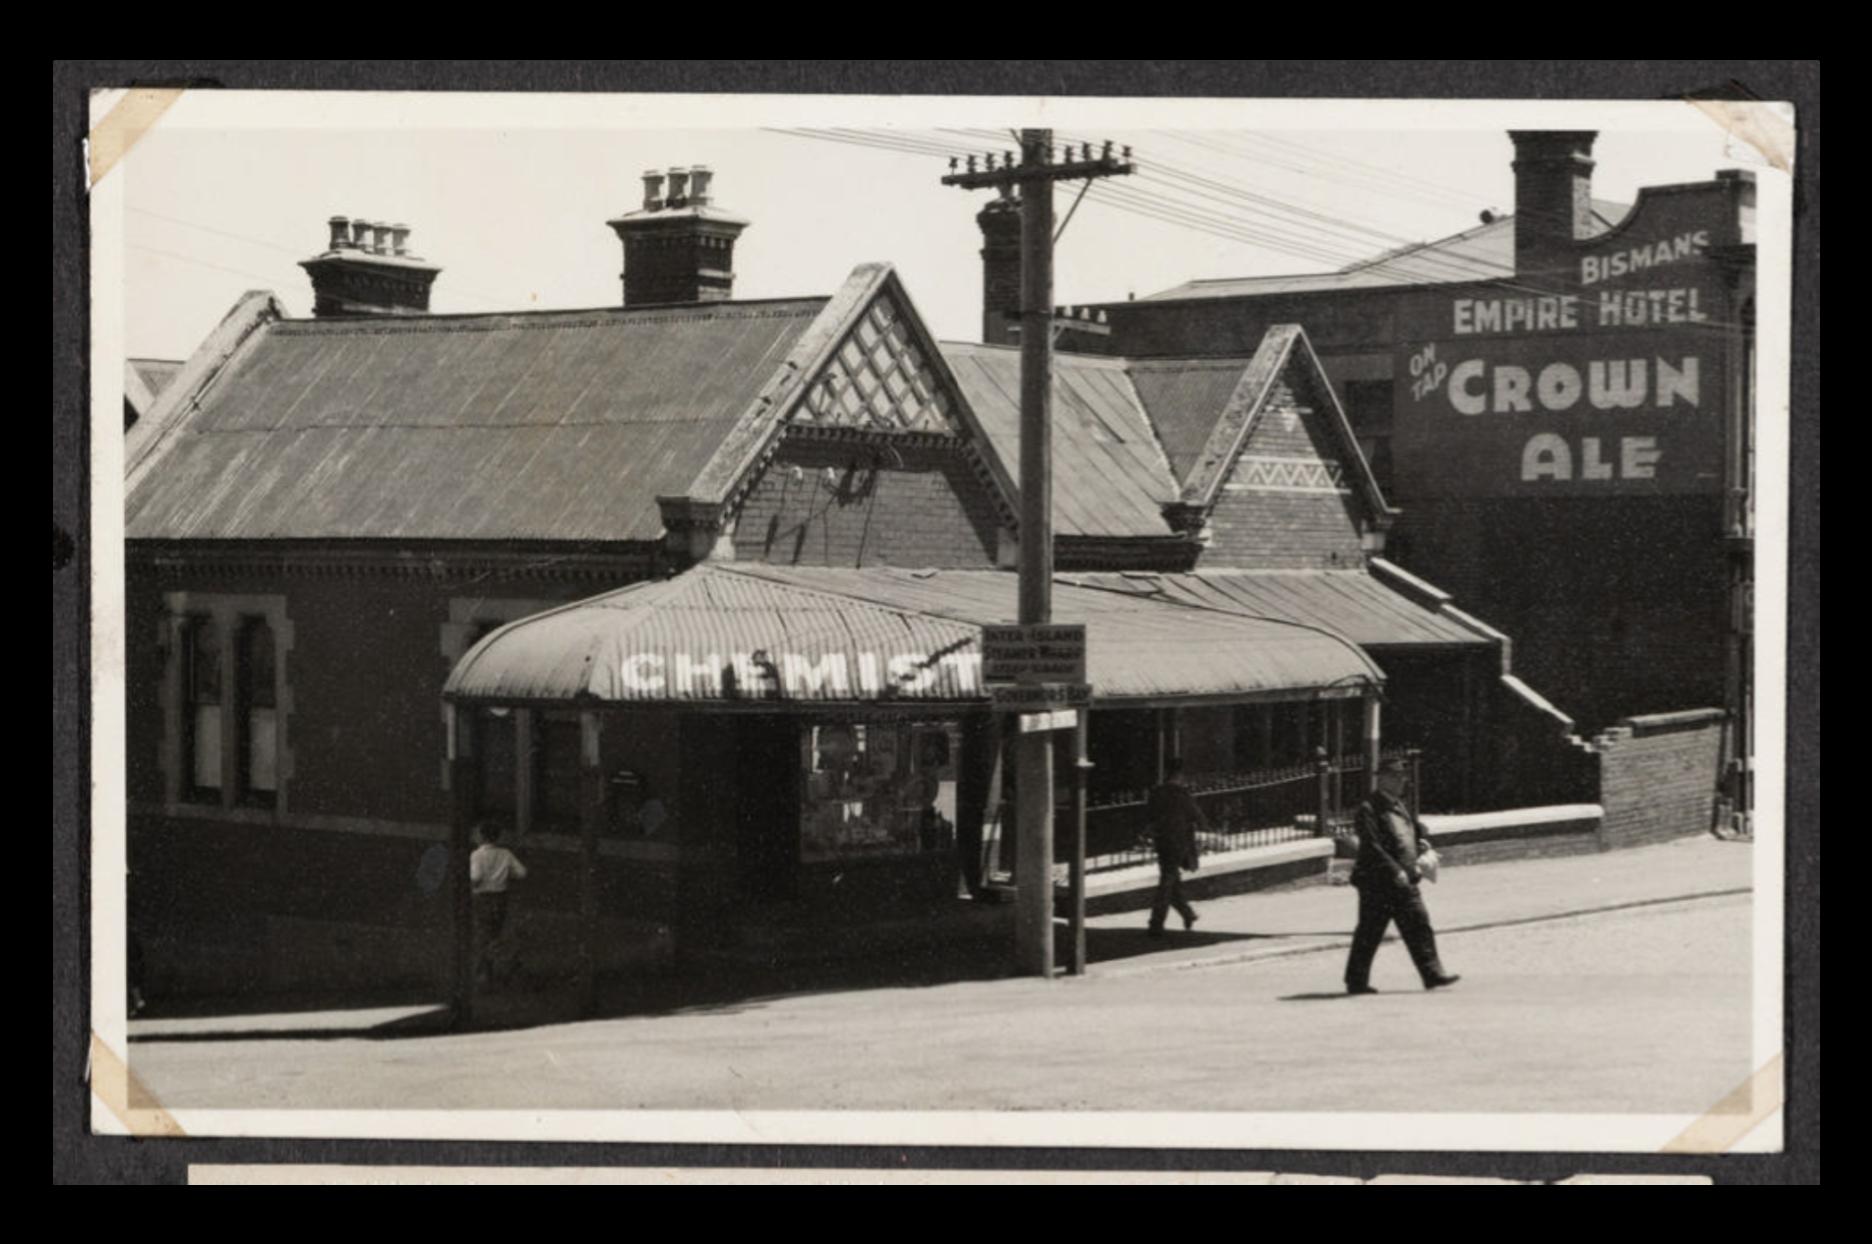 14625 181 Collett's Corner, and D.E.L. Chemist, corner of Oxford and London Streets.